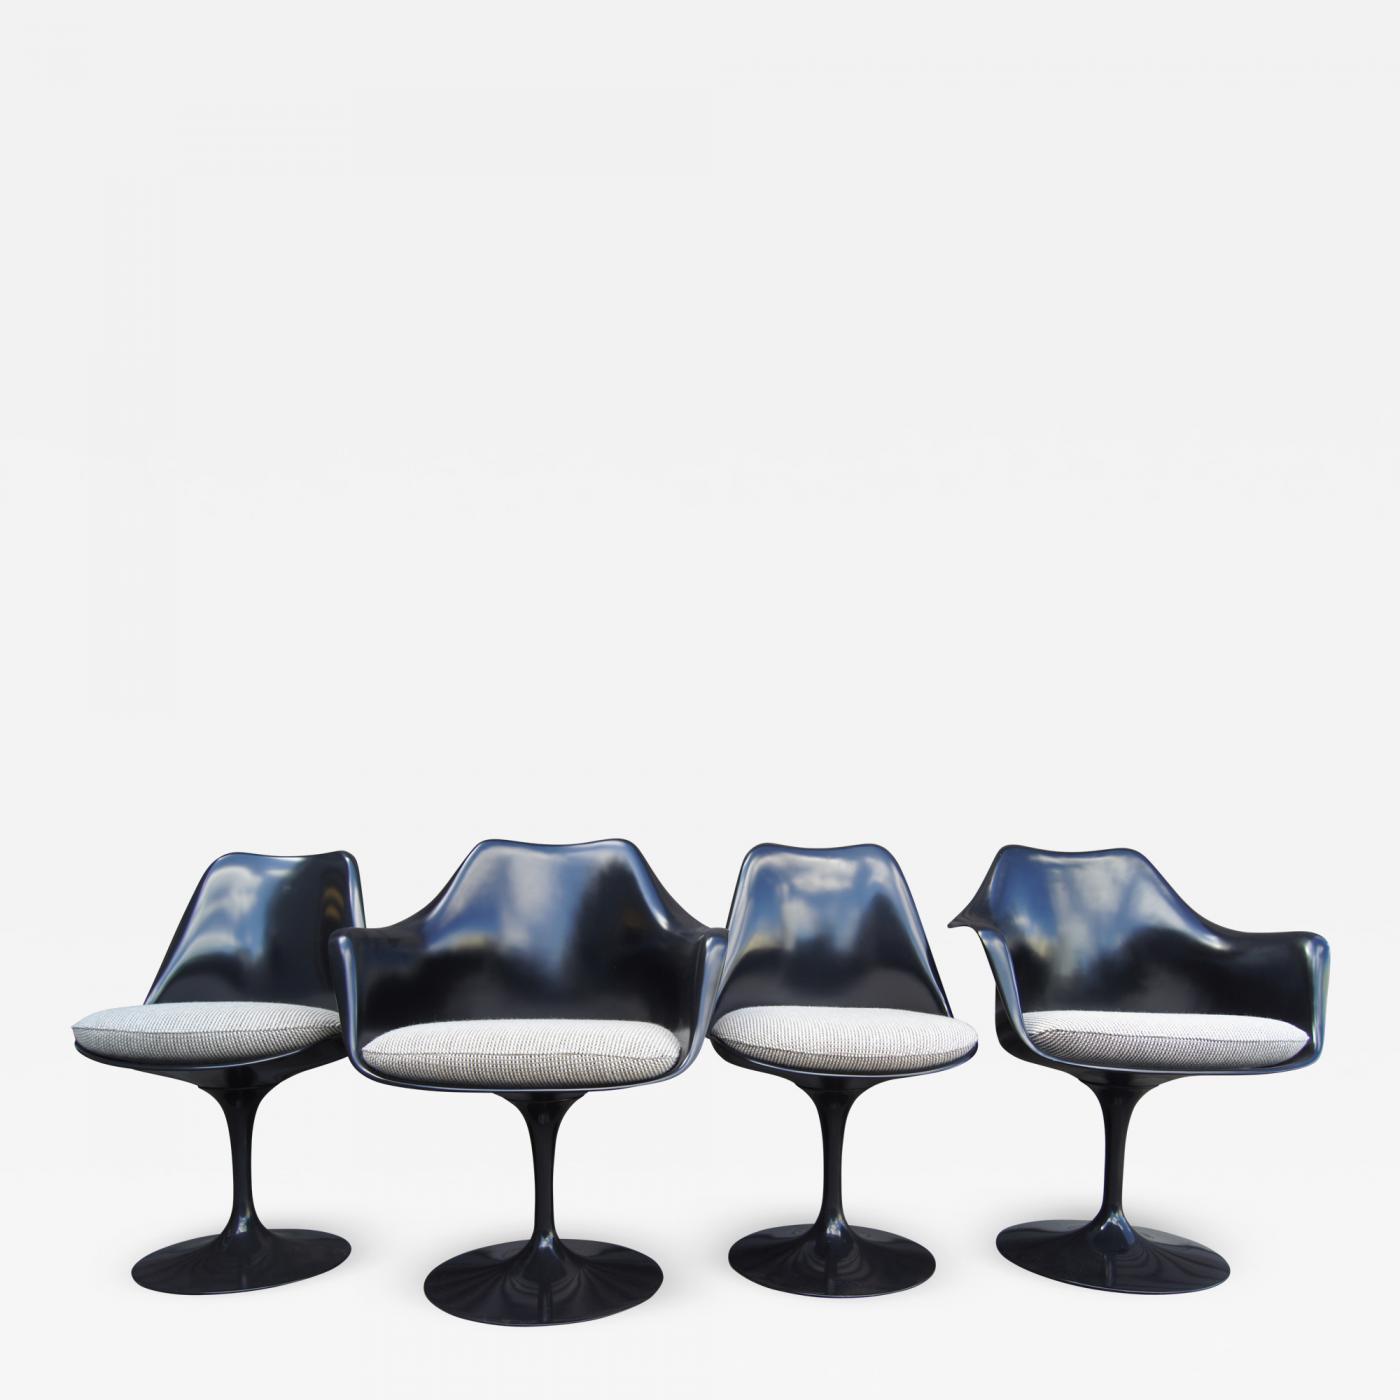 Eero Saarinen Set Of Four Black Tulip Chairs By Eero Saarinen For Knoll